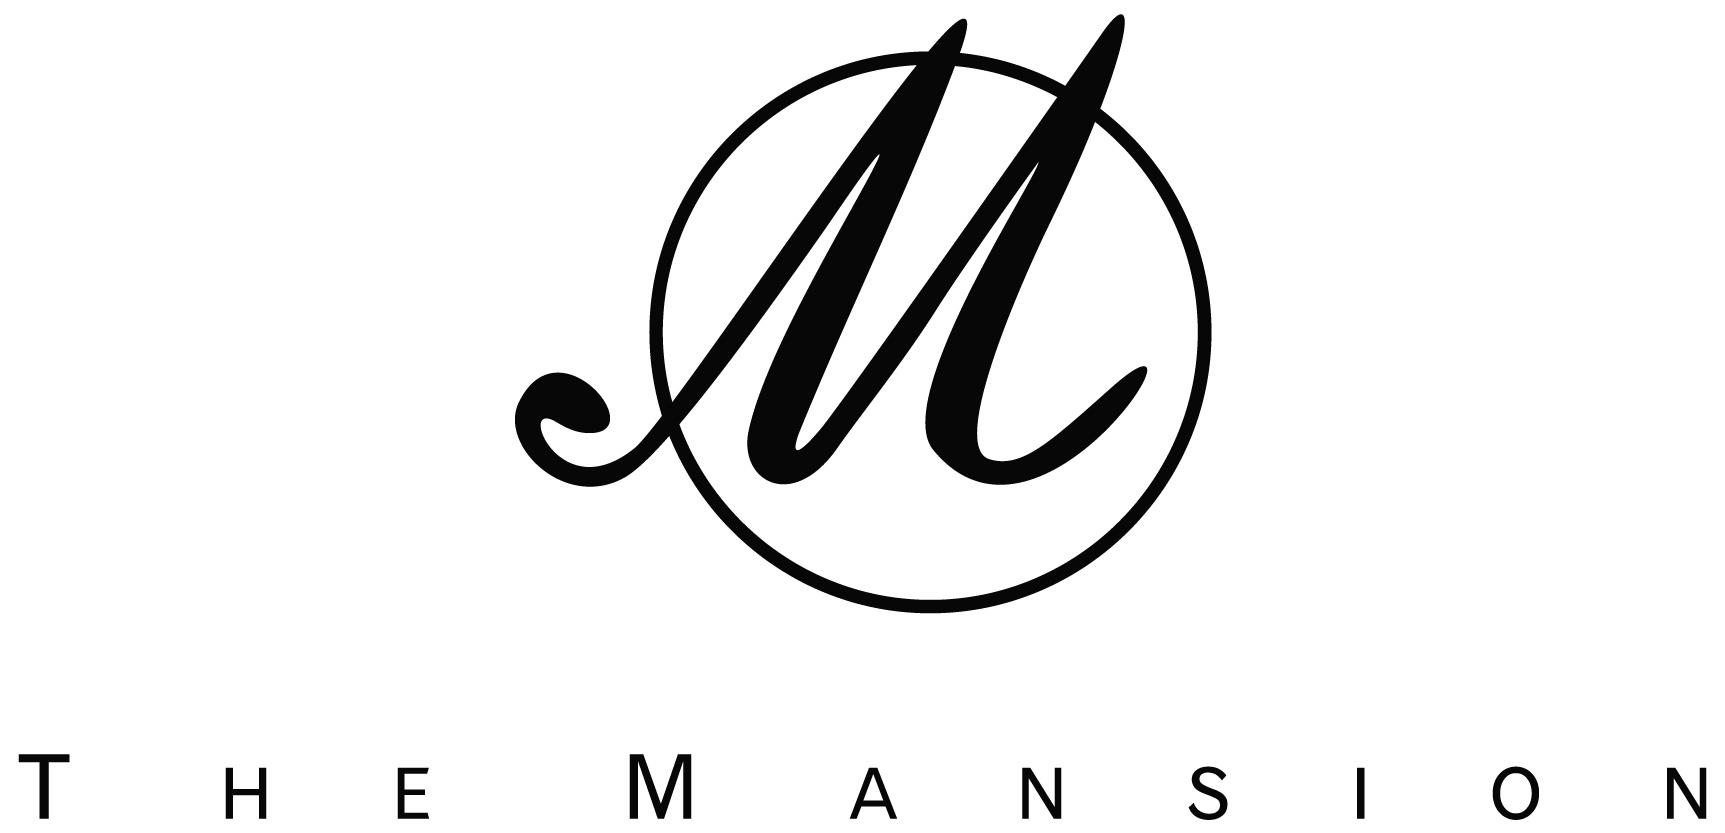 mansion bw logo 1 (2015_12_08 23_44_13 UTC) copy.jpg